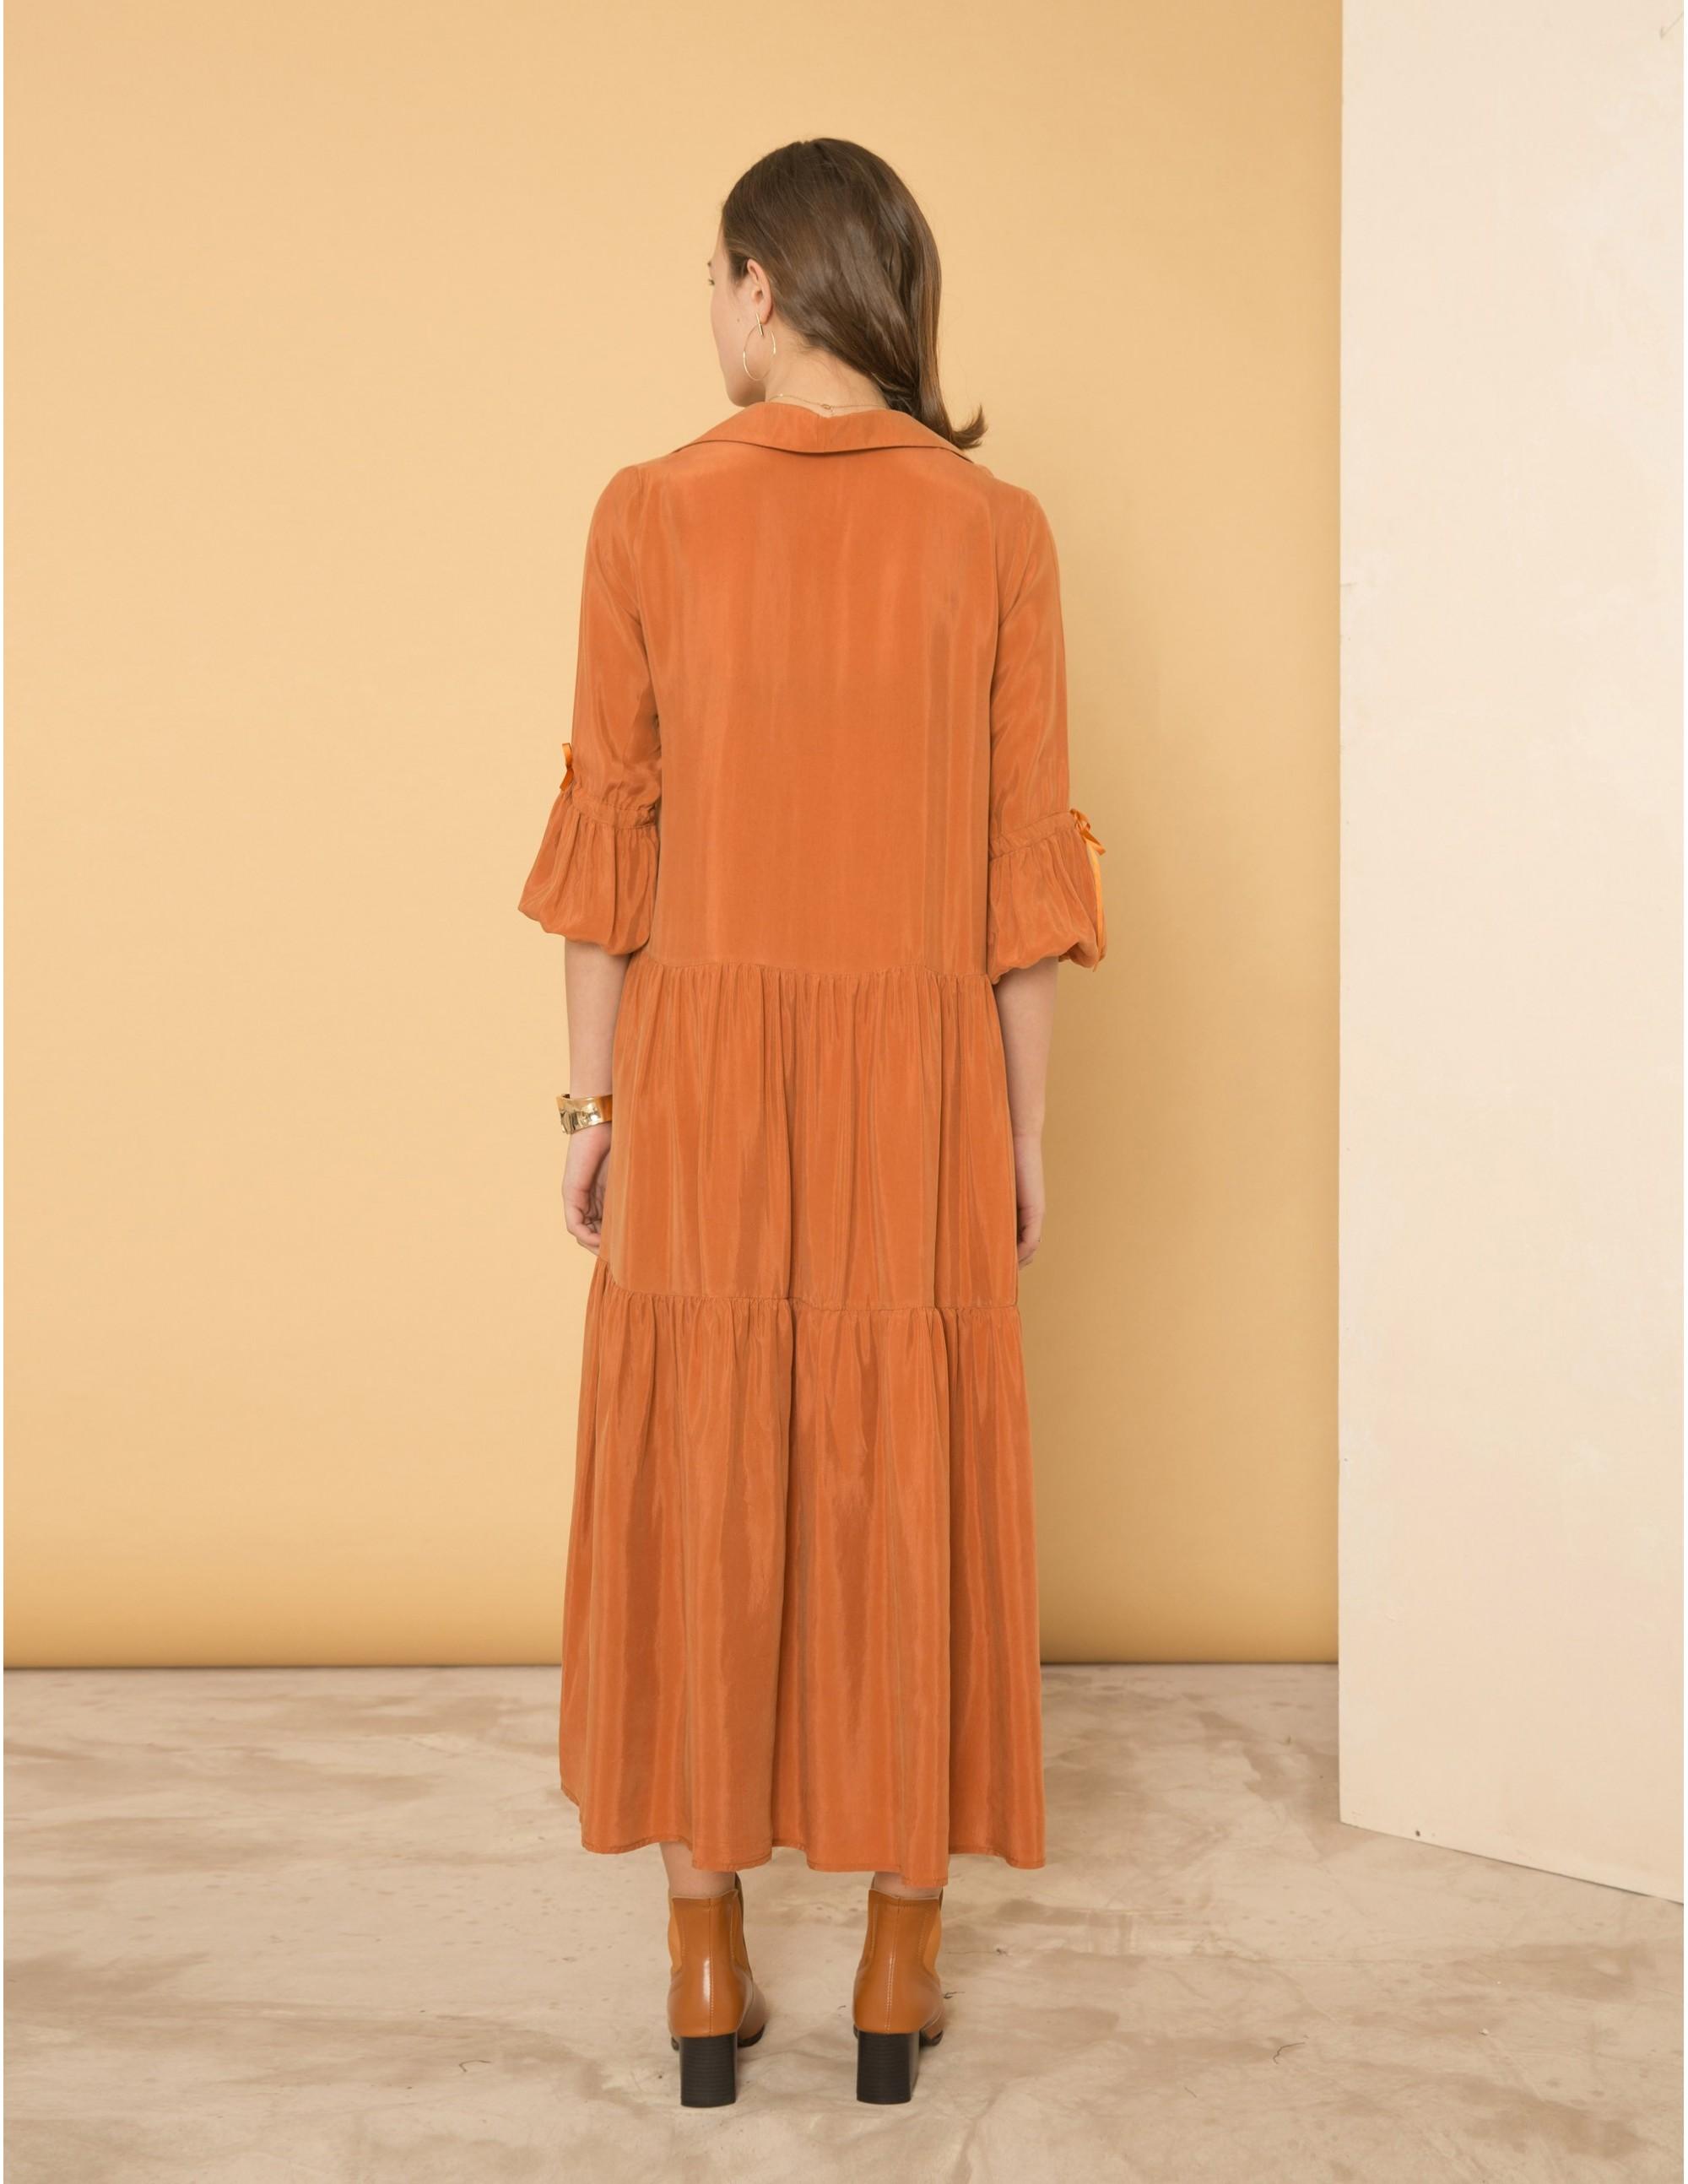 ATTRACTION Dress - SWEET CINNAMON